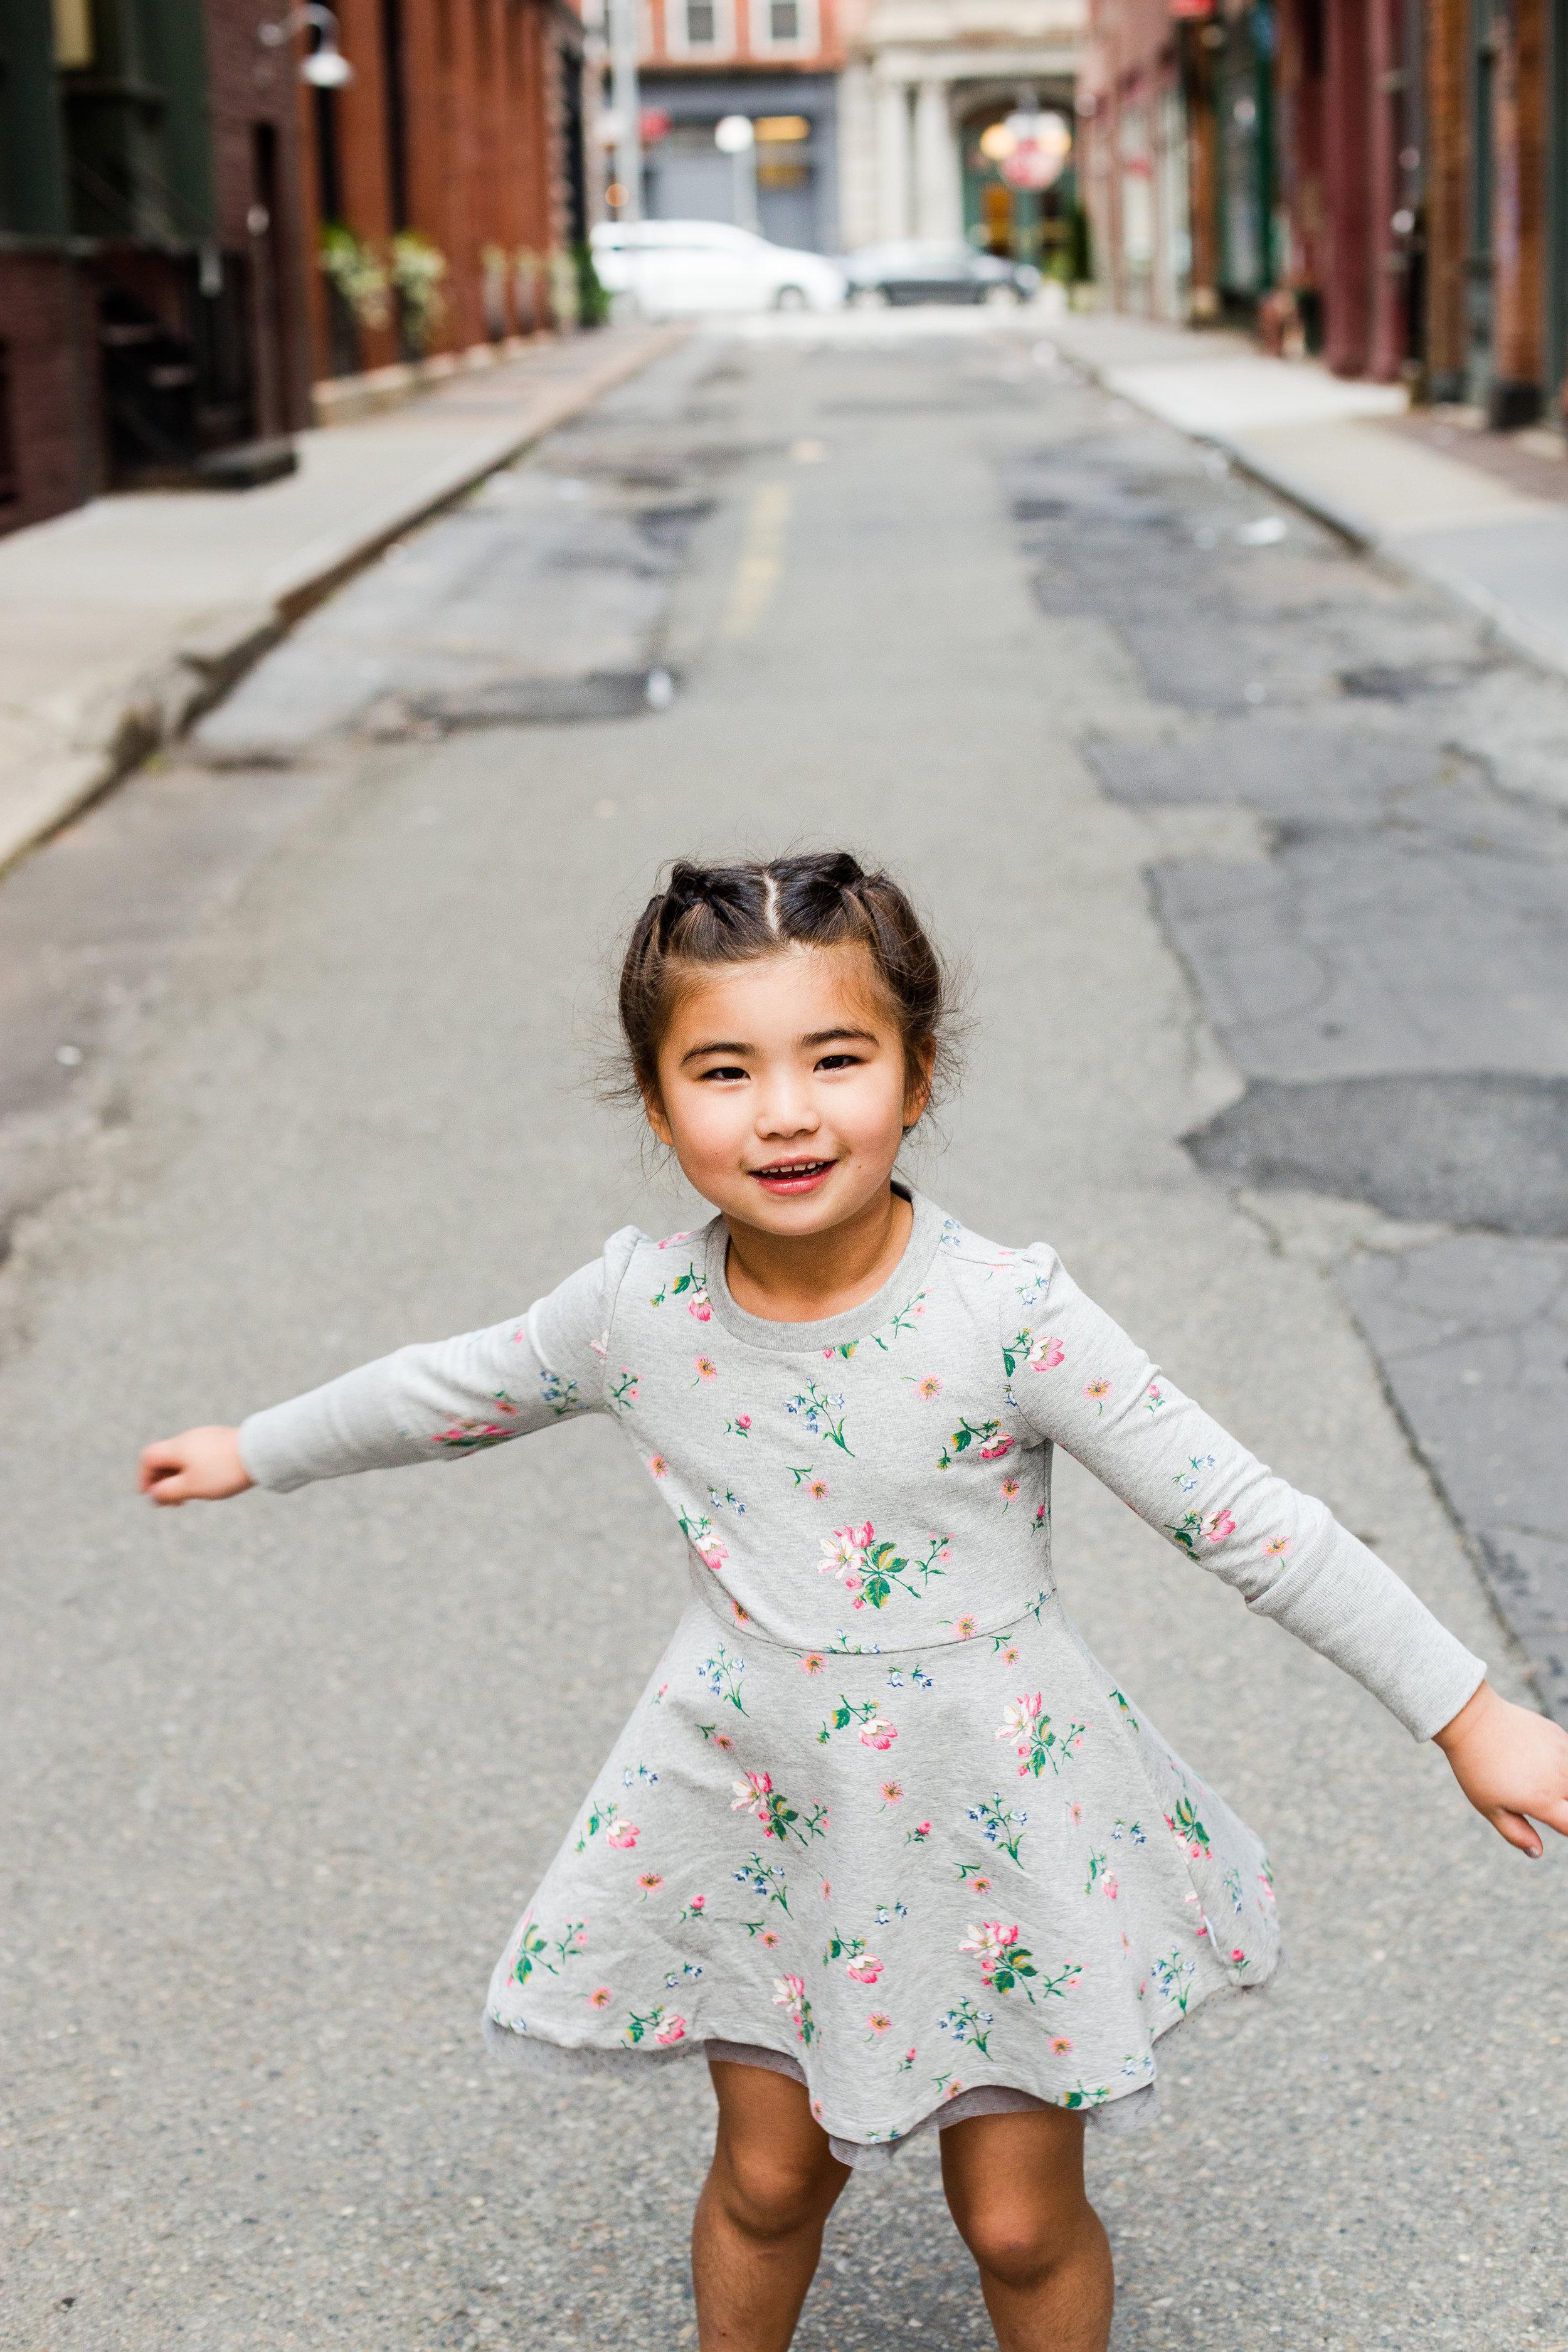 lissiephoto_loomis_nyc_family_photography48.JPG